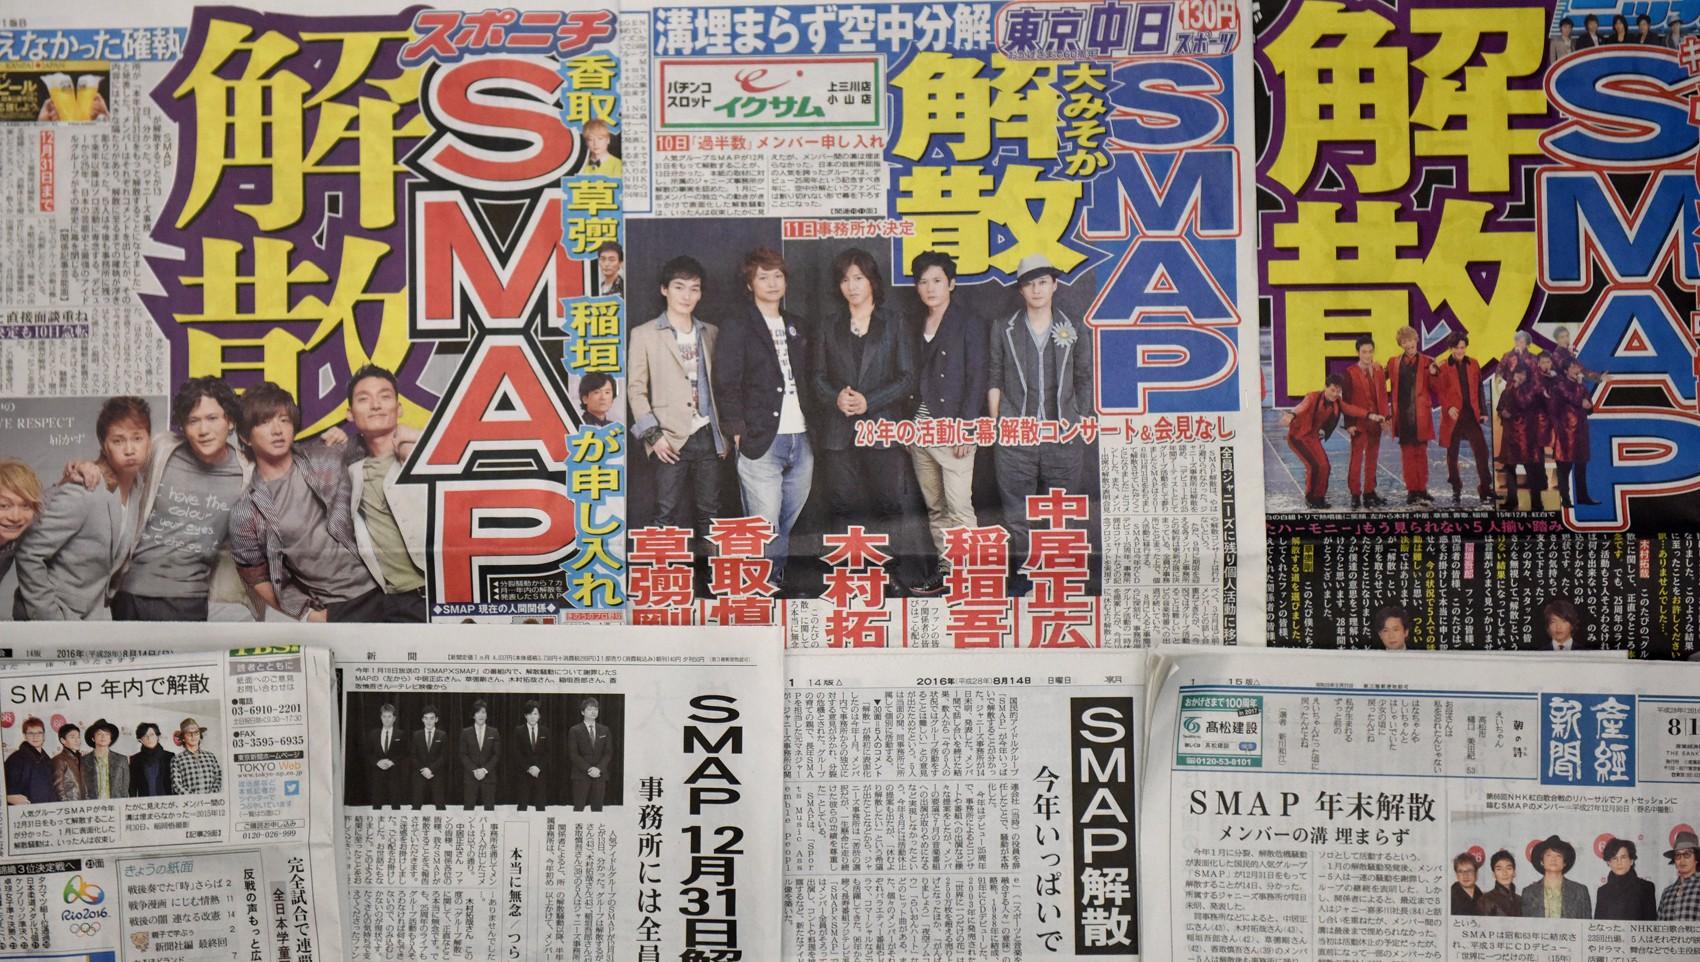 Jornais japoneses repercutem fim da banda popular SMAP neste domingo (14)  (Foto: Toru Yamanaka/AFP)